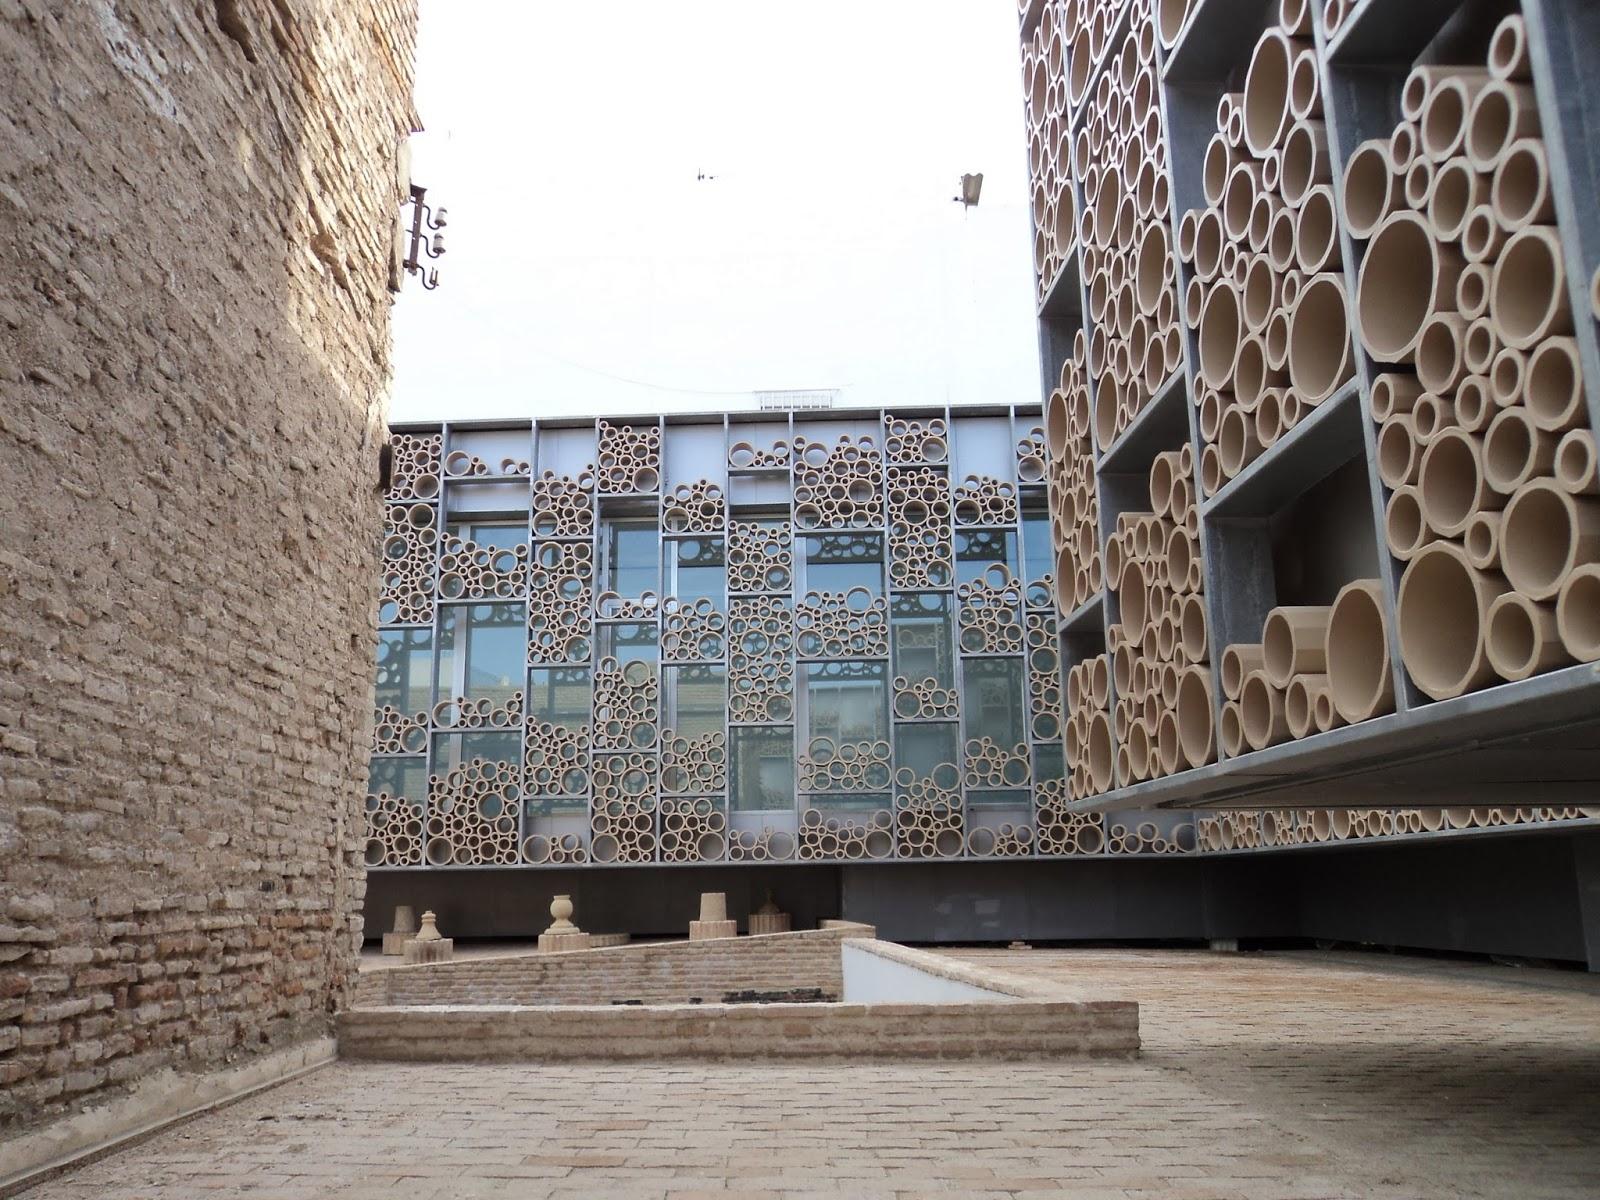 Patrimonium hispalense el germen del museo de historia de sevilla - Escuela tecnica superior de arquitectura sevilla ...